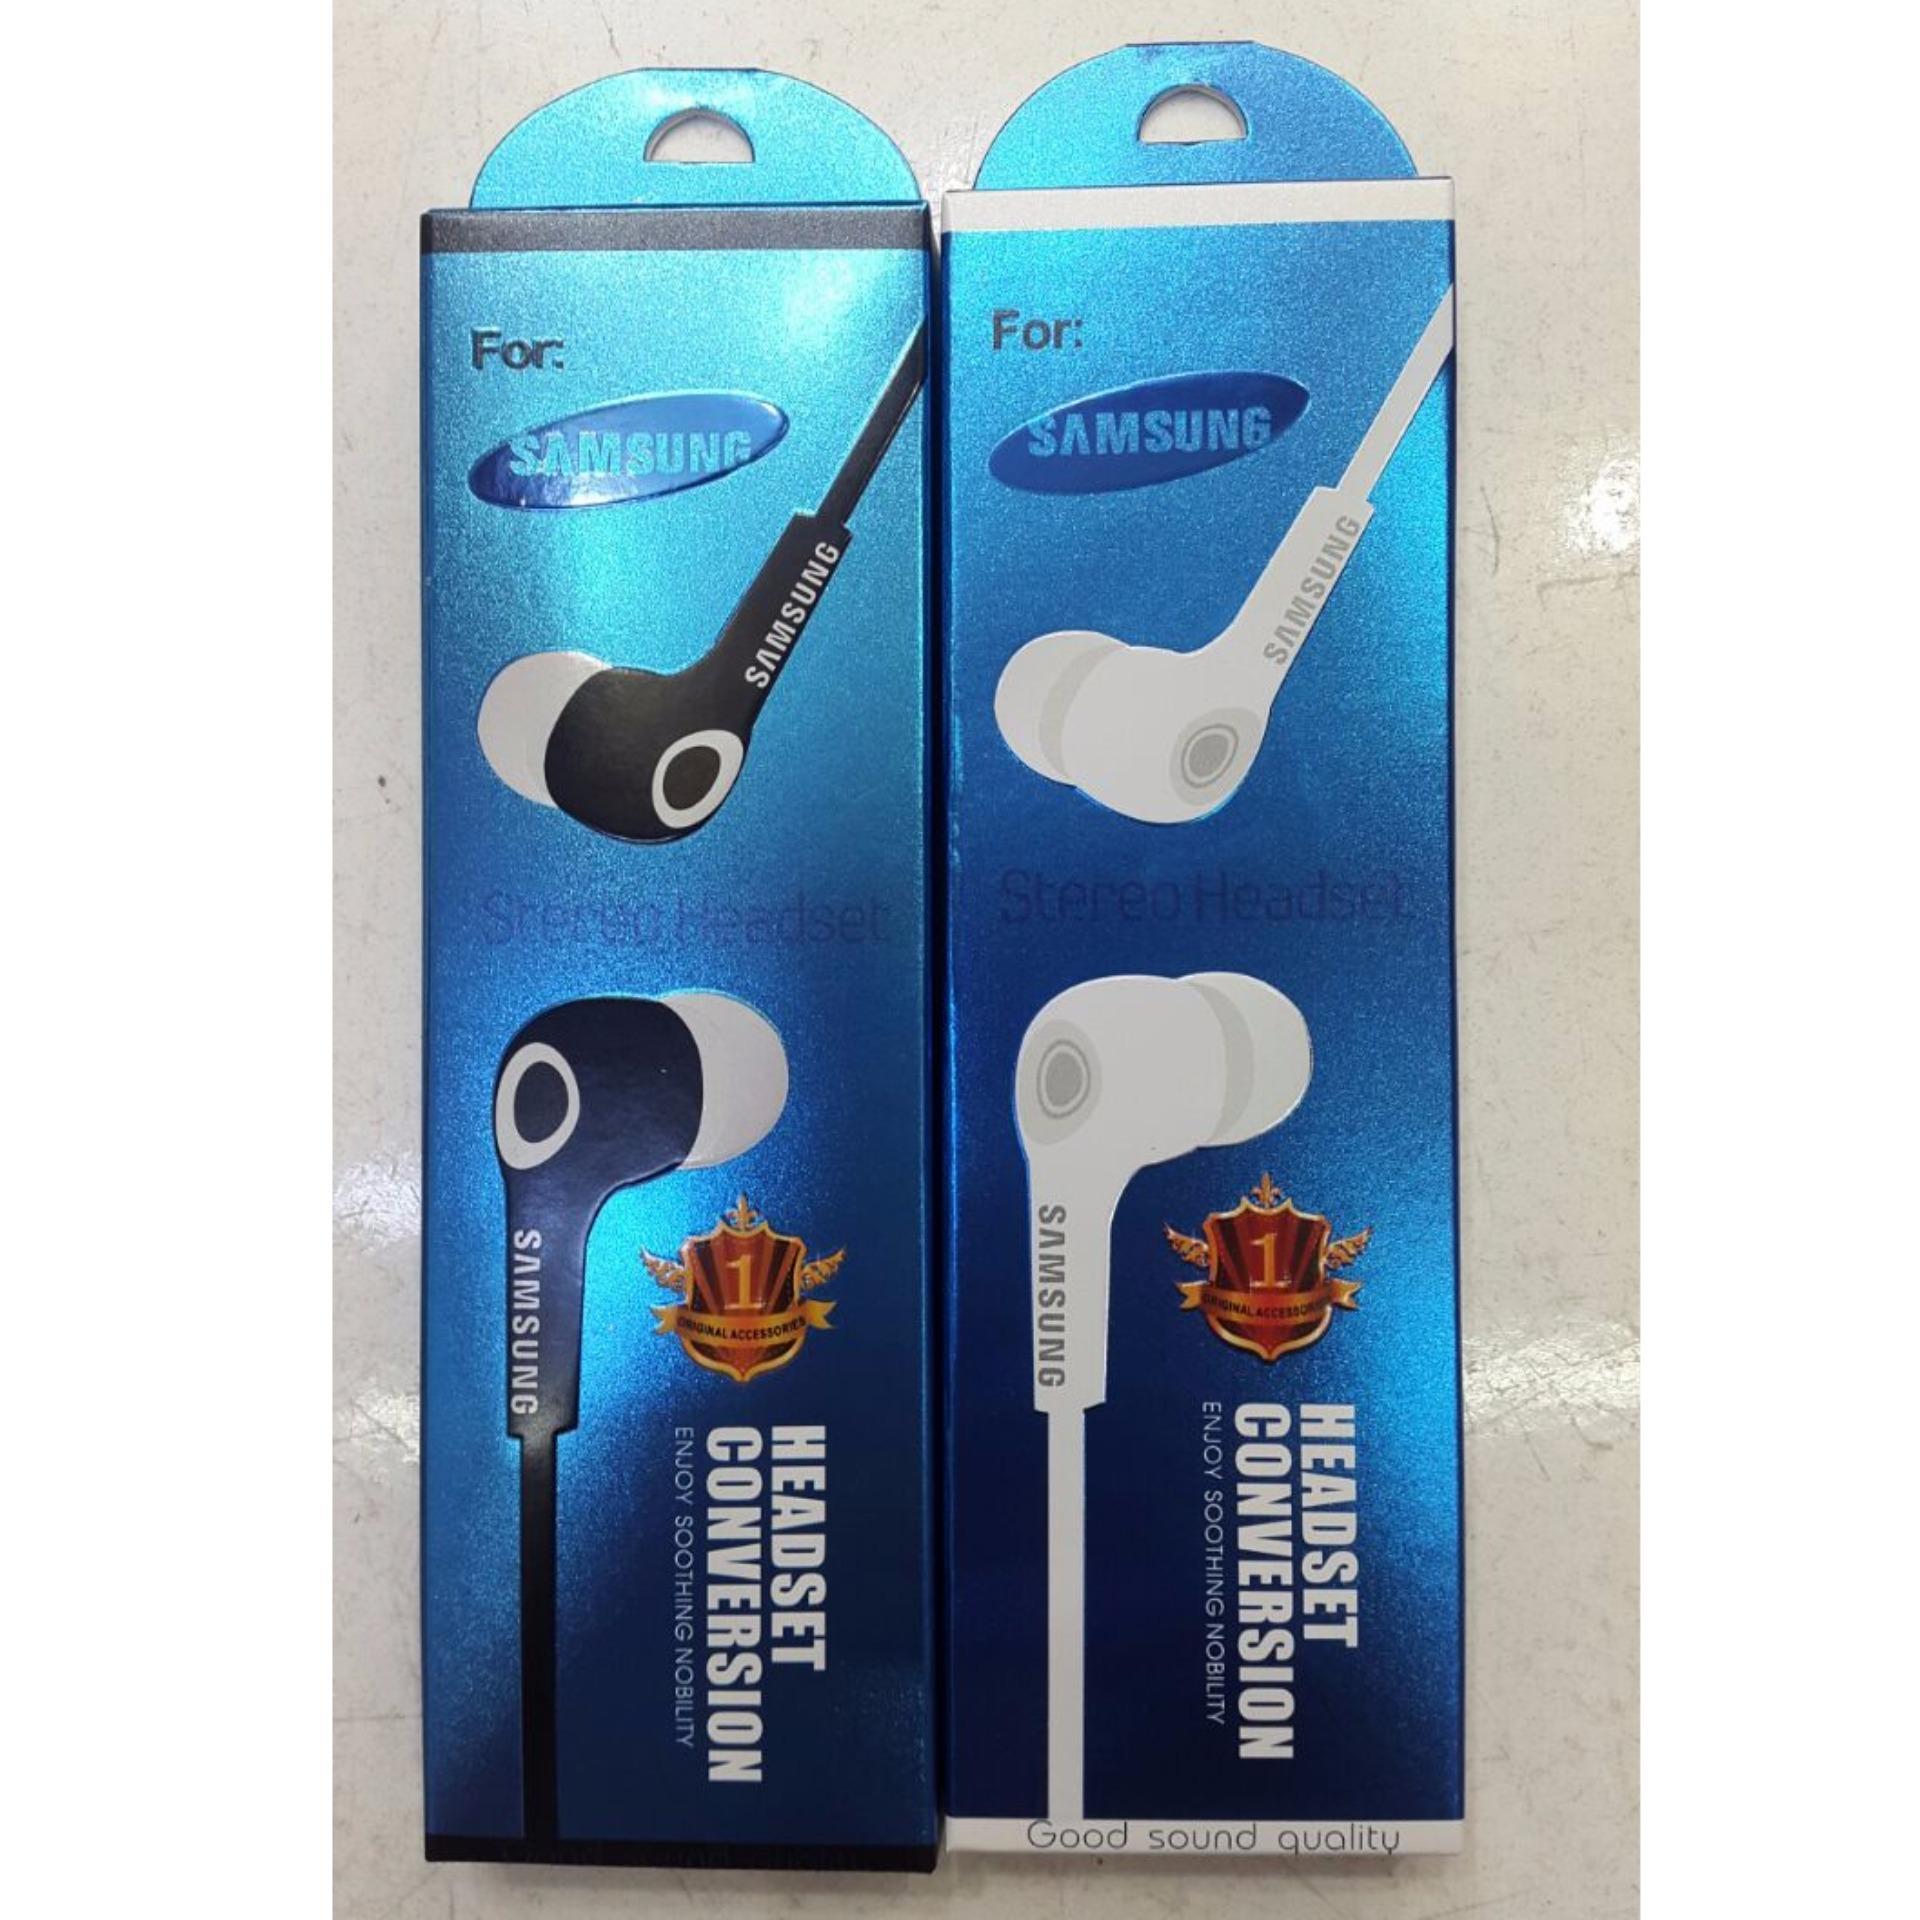 Handsfree Headset Earphone For Samsung S4j7j5 In Ear Bud Microphone Putih Bandingkan Toko Conversion Stereo Warna Random Harga Baru Hanya Rp68